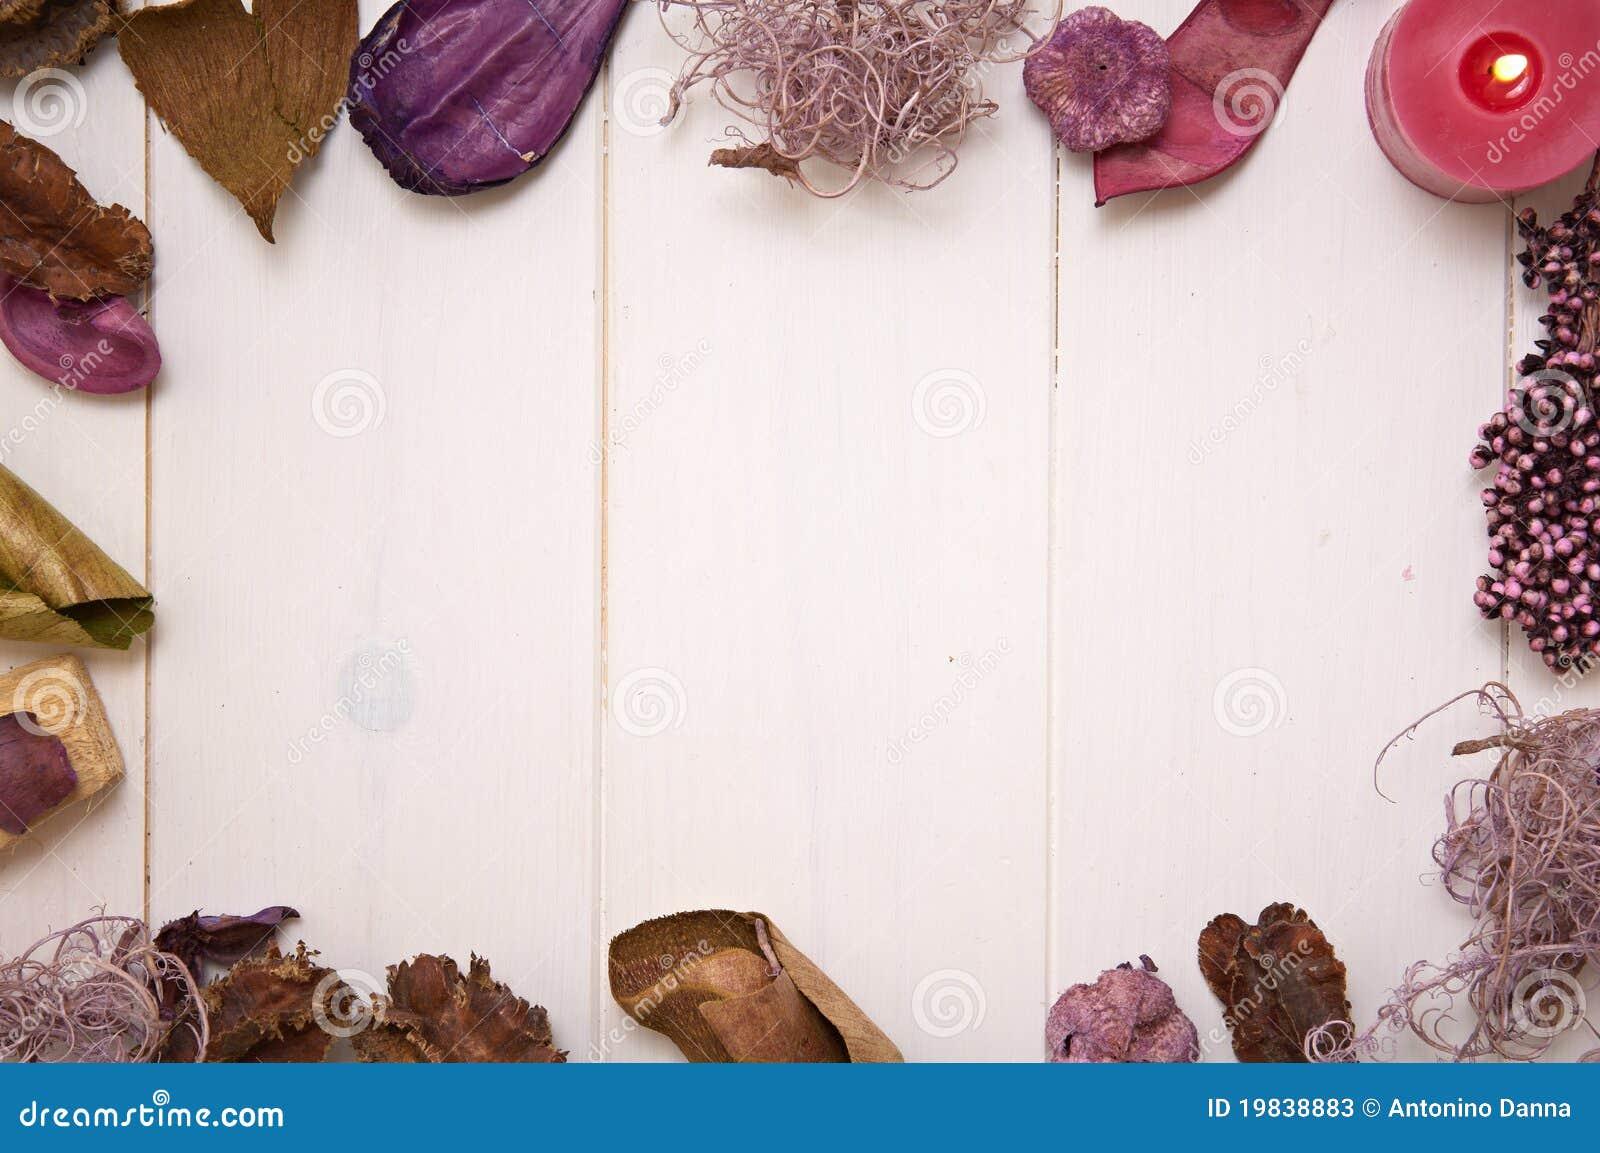 Potpourri frame wallpaper stock image. Image of romantic - 19838883